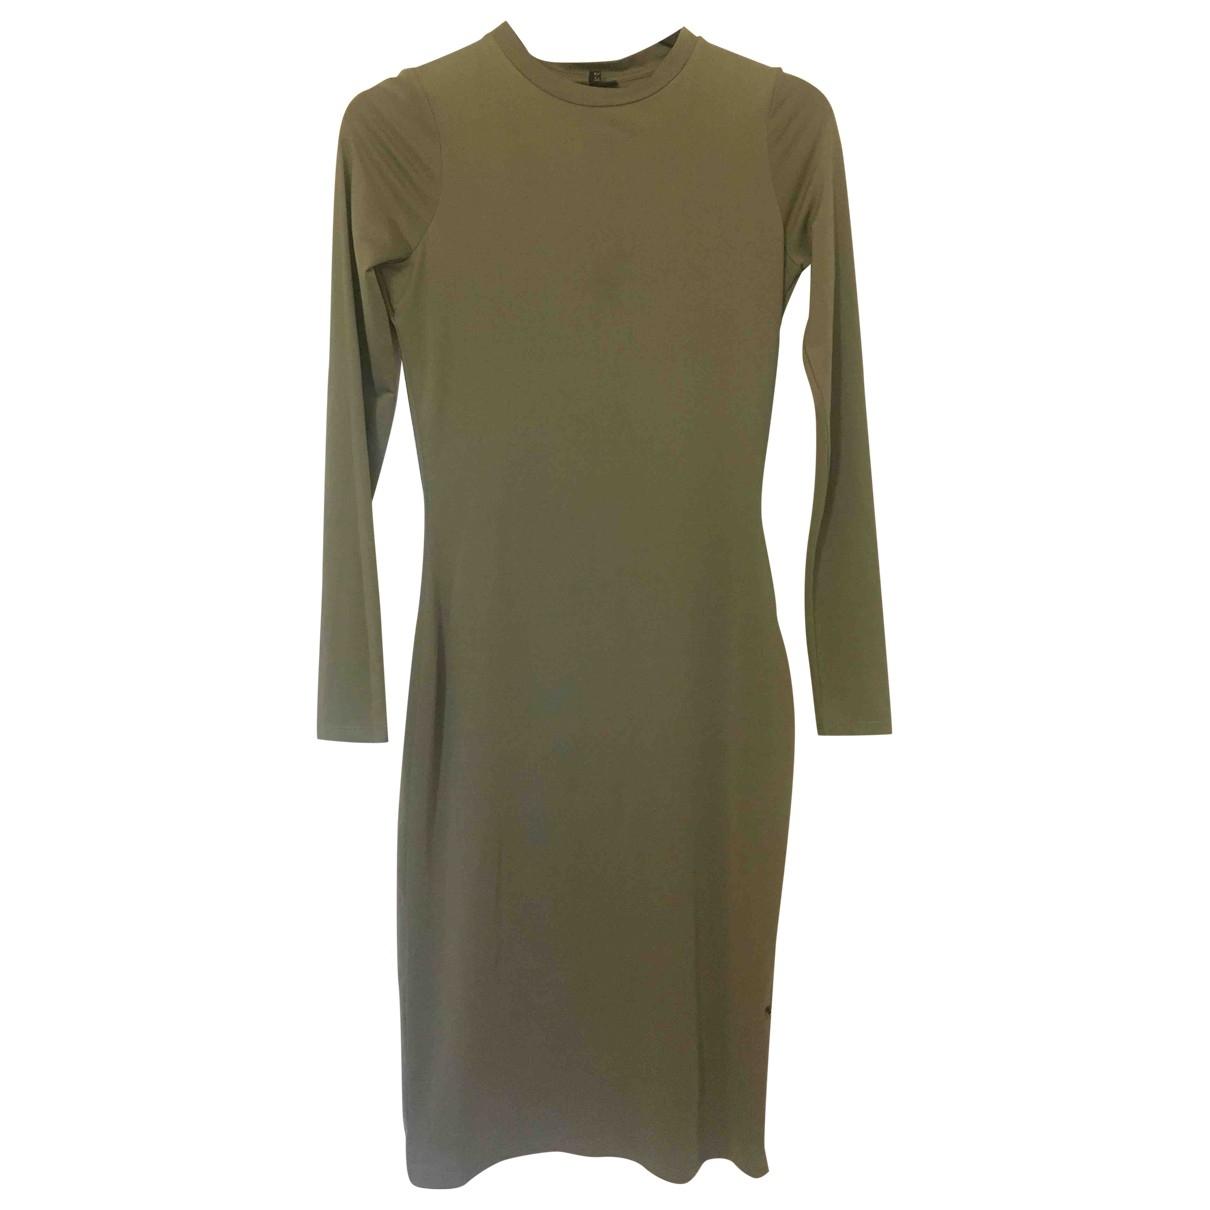 River Island \N Khaki dress for Women 8 UK